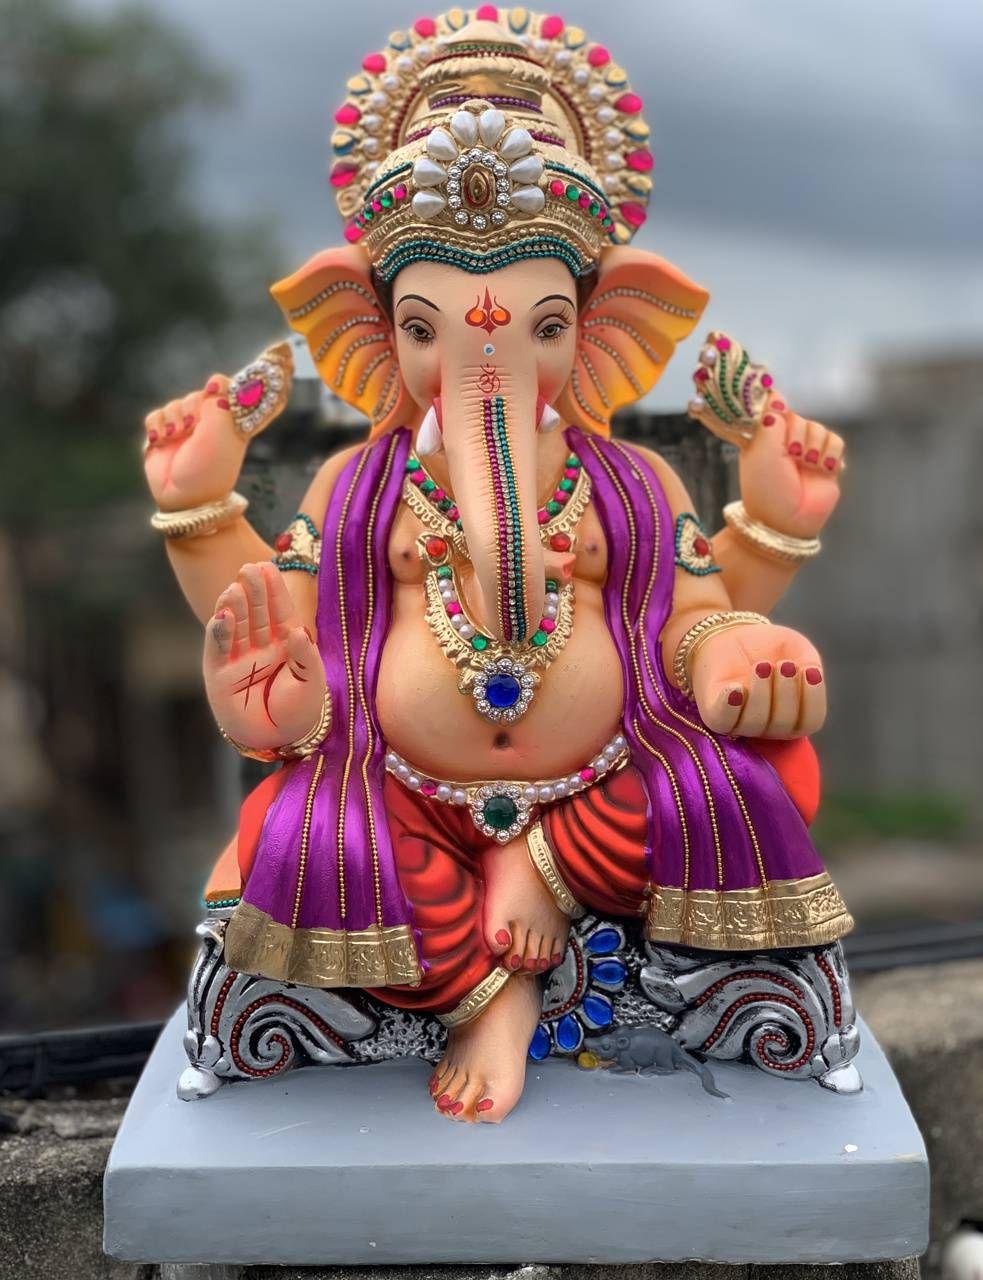 Download Ganpati Wallpaper By Sinhalchirag 4a Free On Zedge Now Browse Millions Of Pop Ganesh Images Happy Ganesh Chaturthi Happy Ganesh Chaturthi Images Ganpati wallpaper hd download